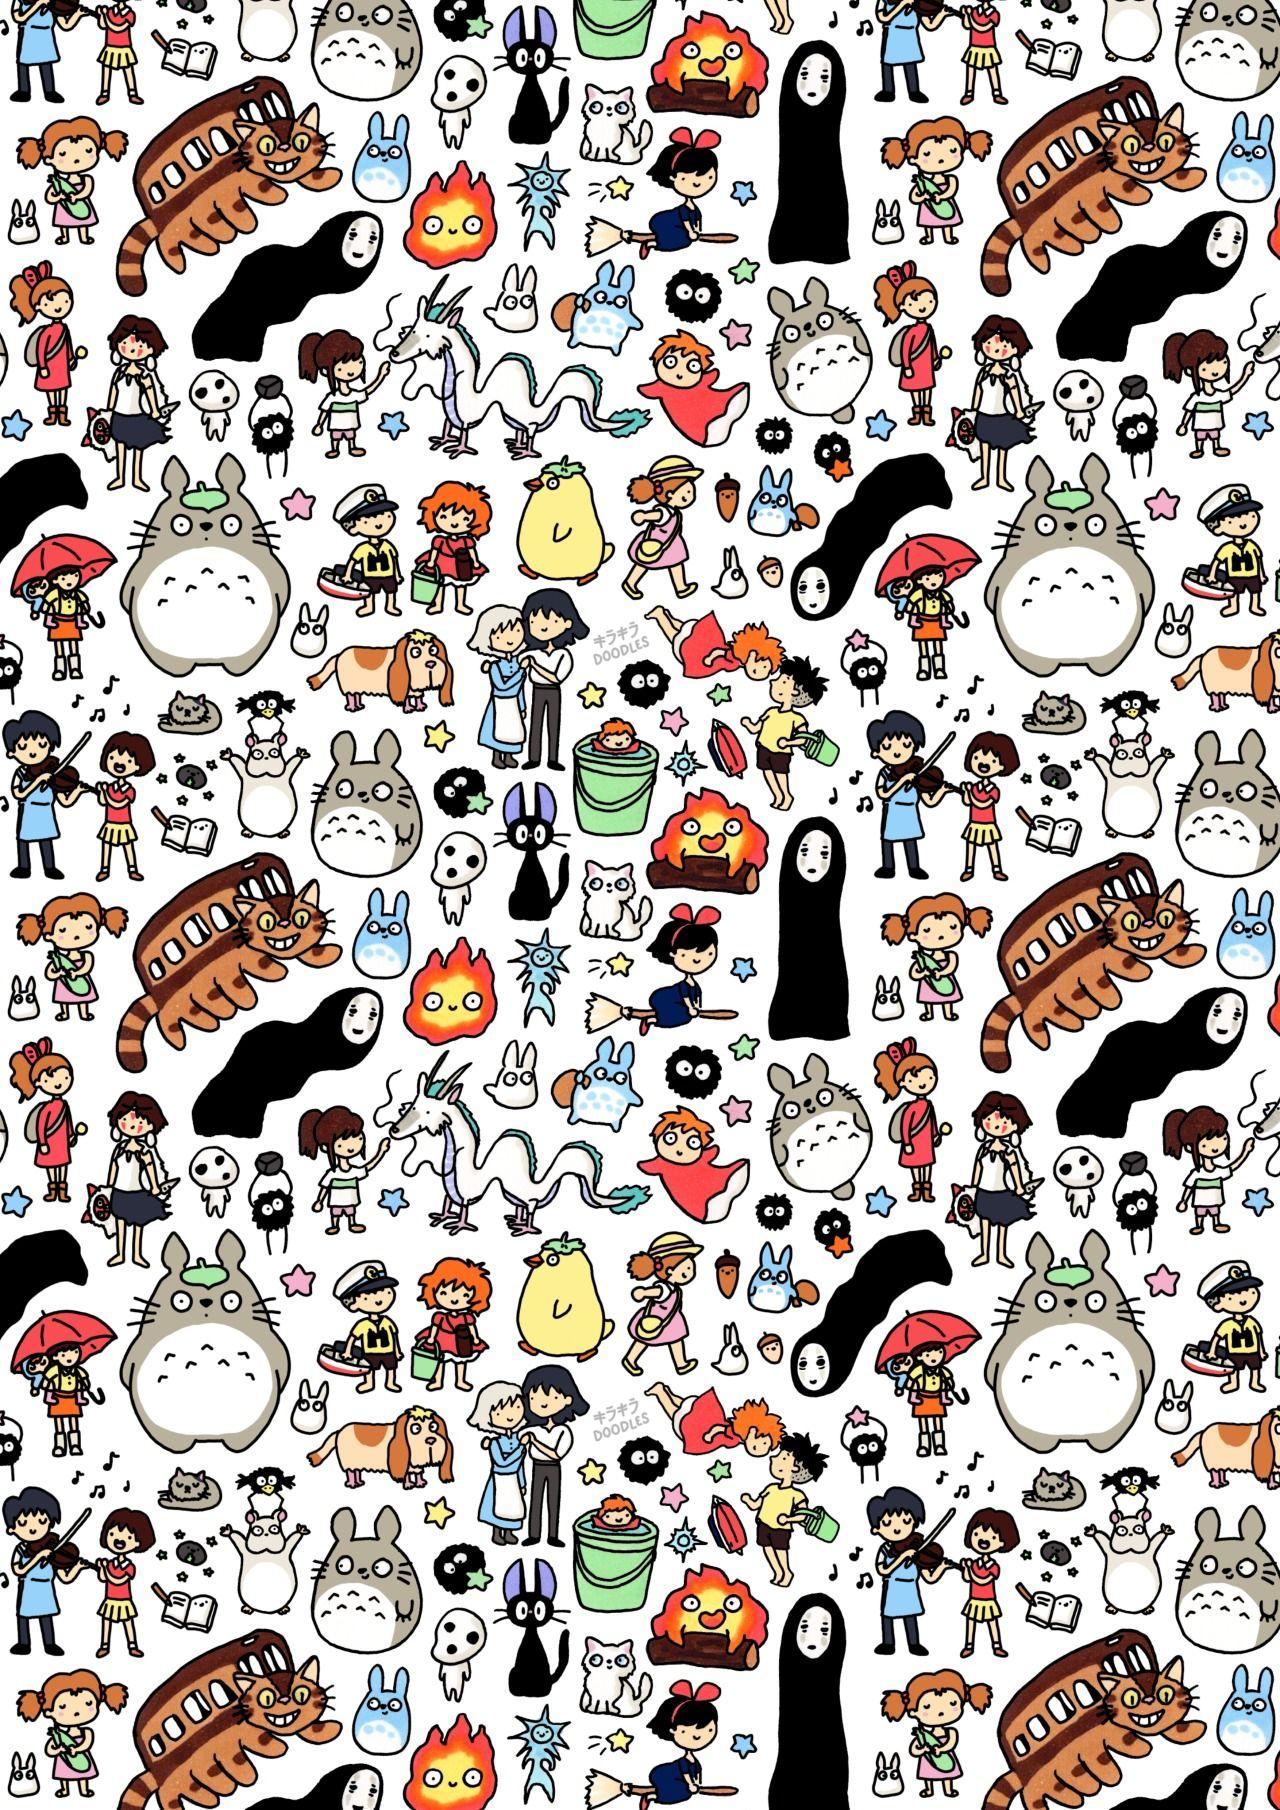 Studio Ghibli スタジオジブリ 鳥 イラスト かわいい 宮崎駿